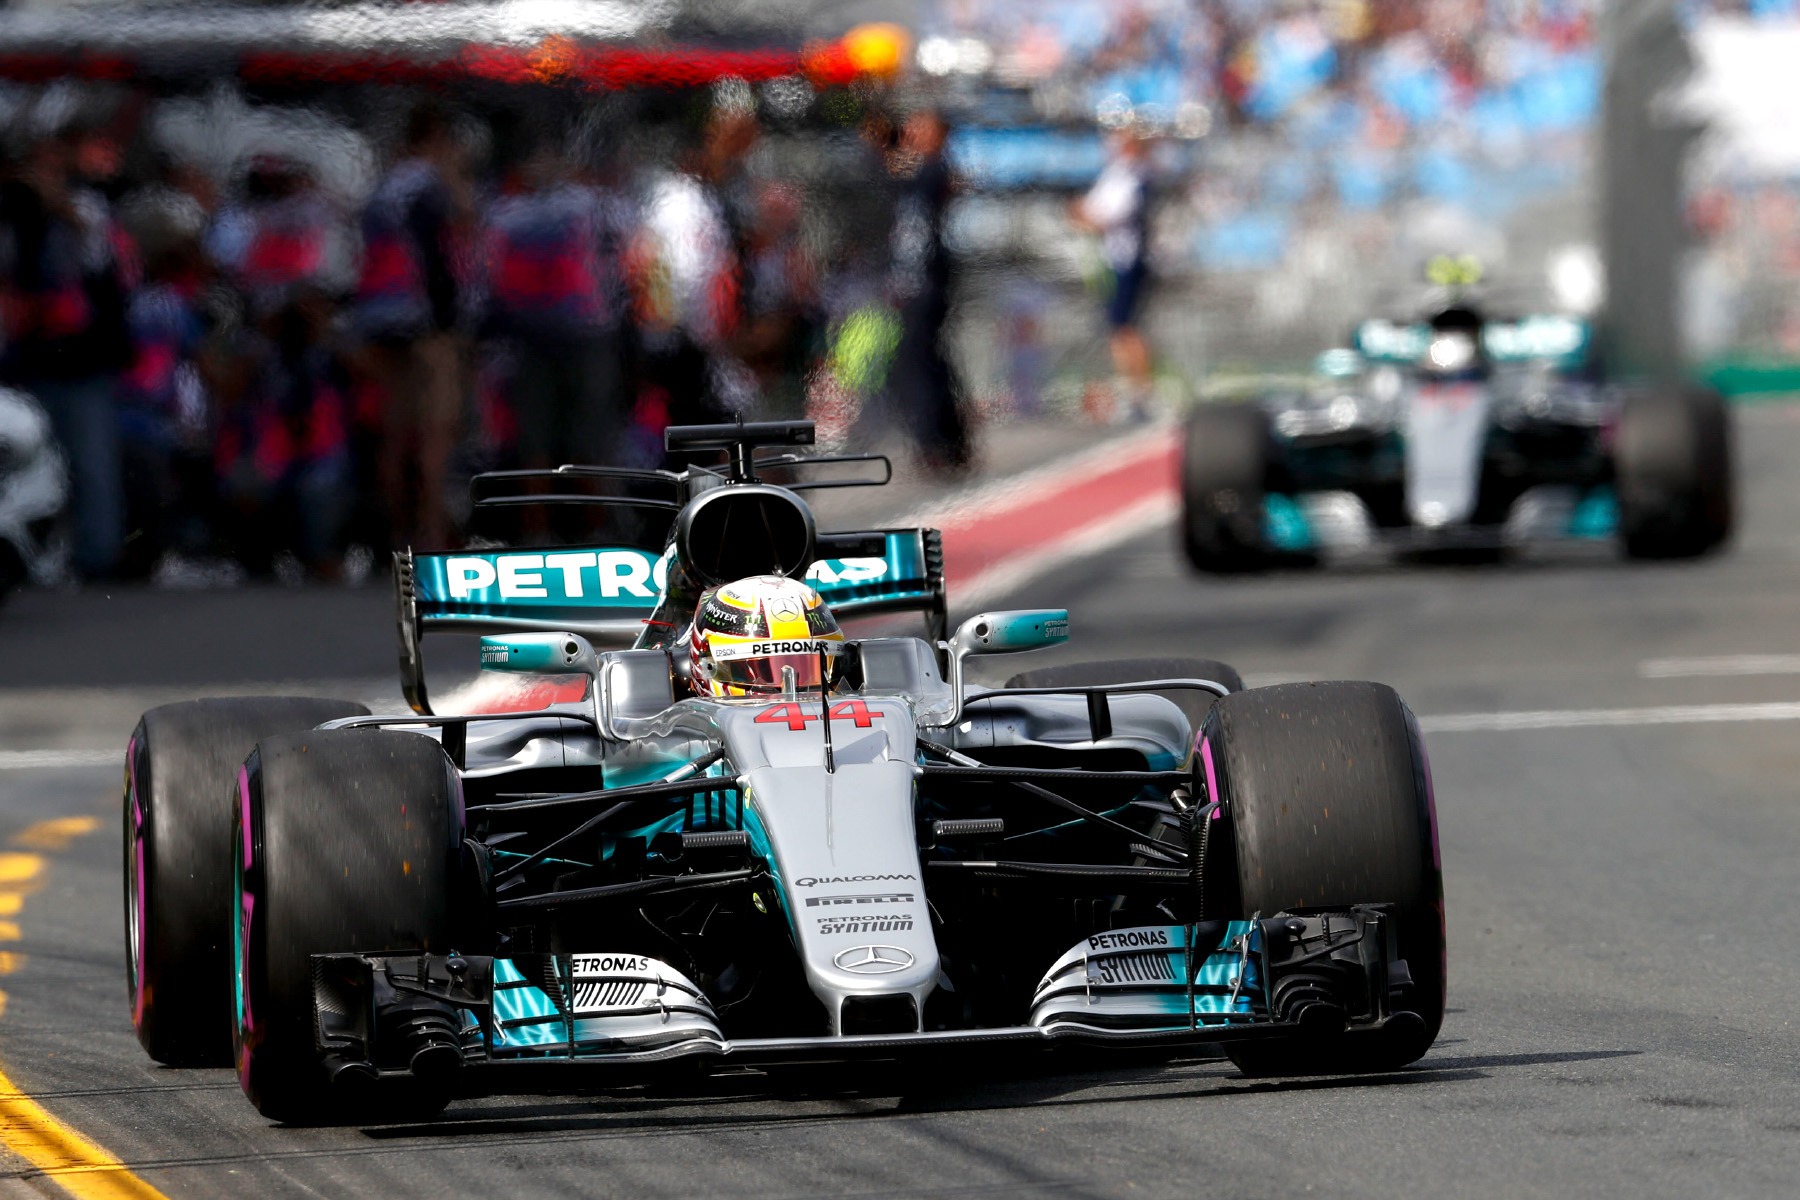 Hamilton rockets into dominant Australian practice lead